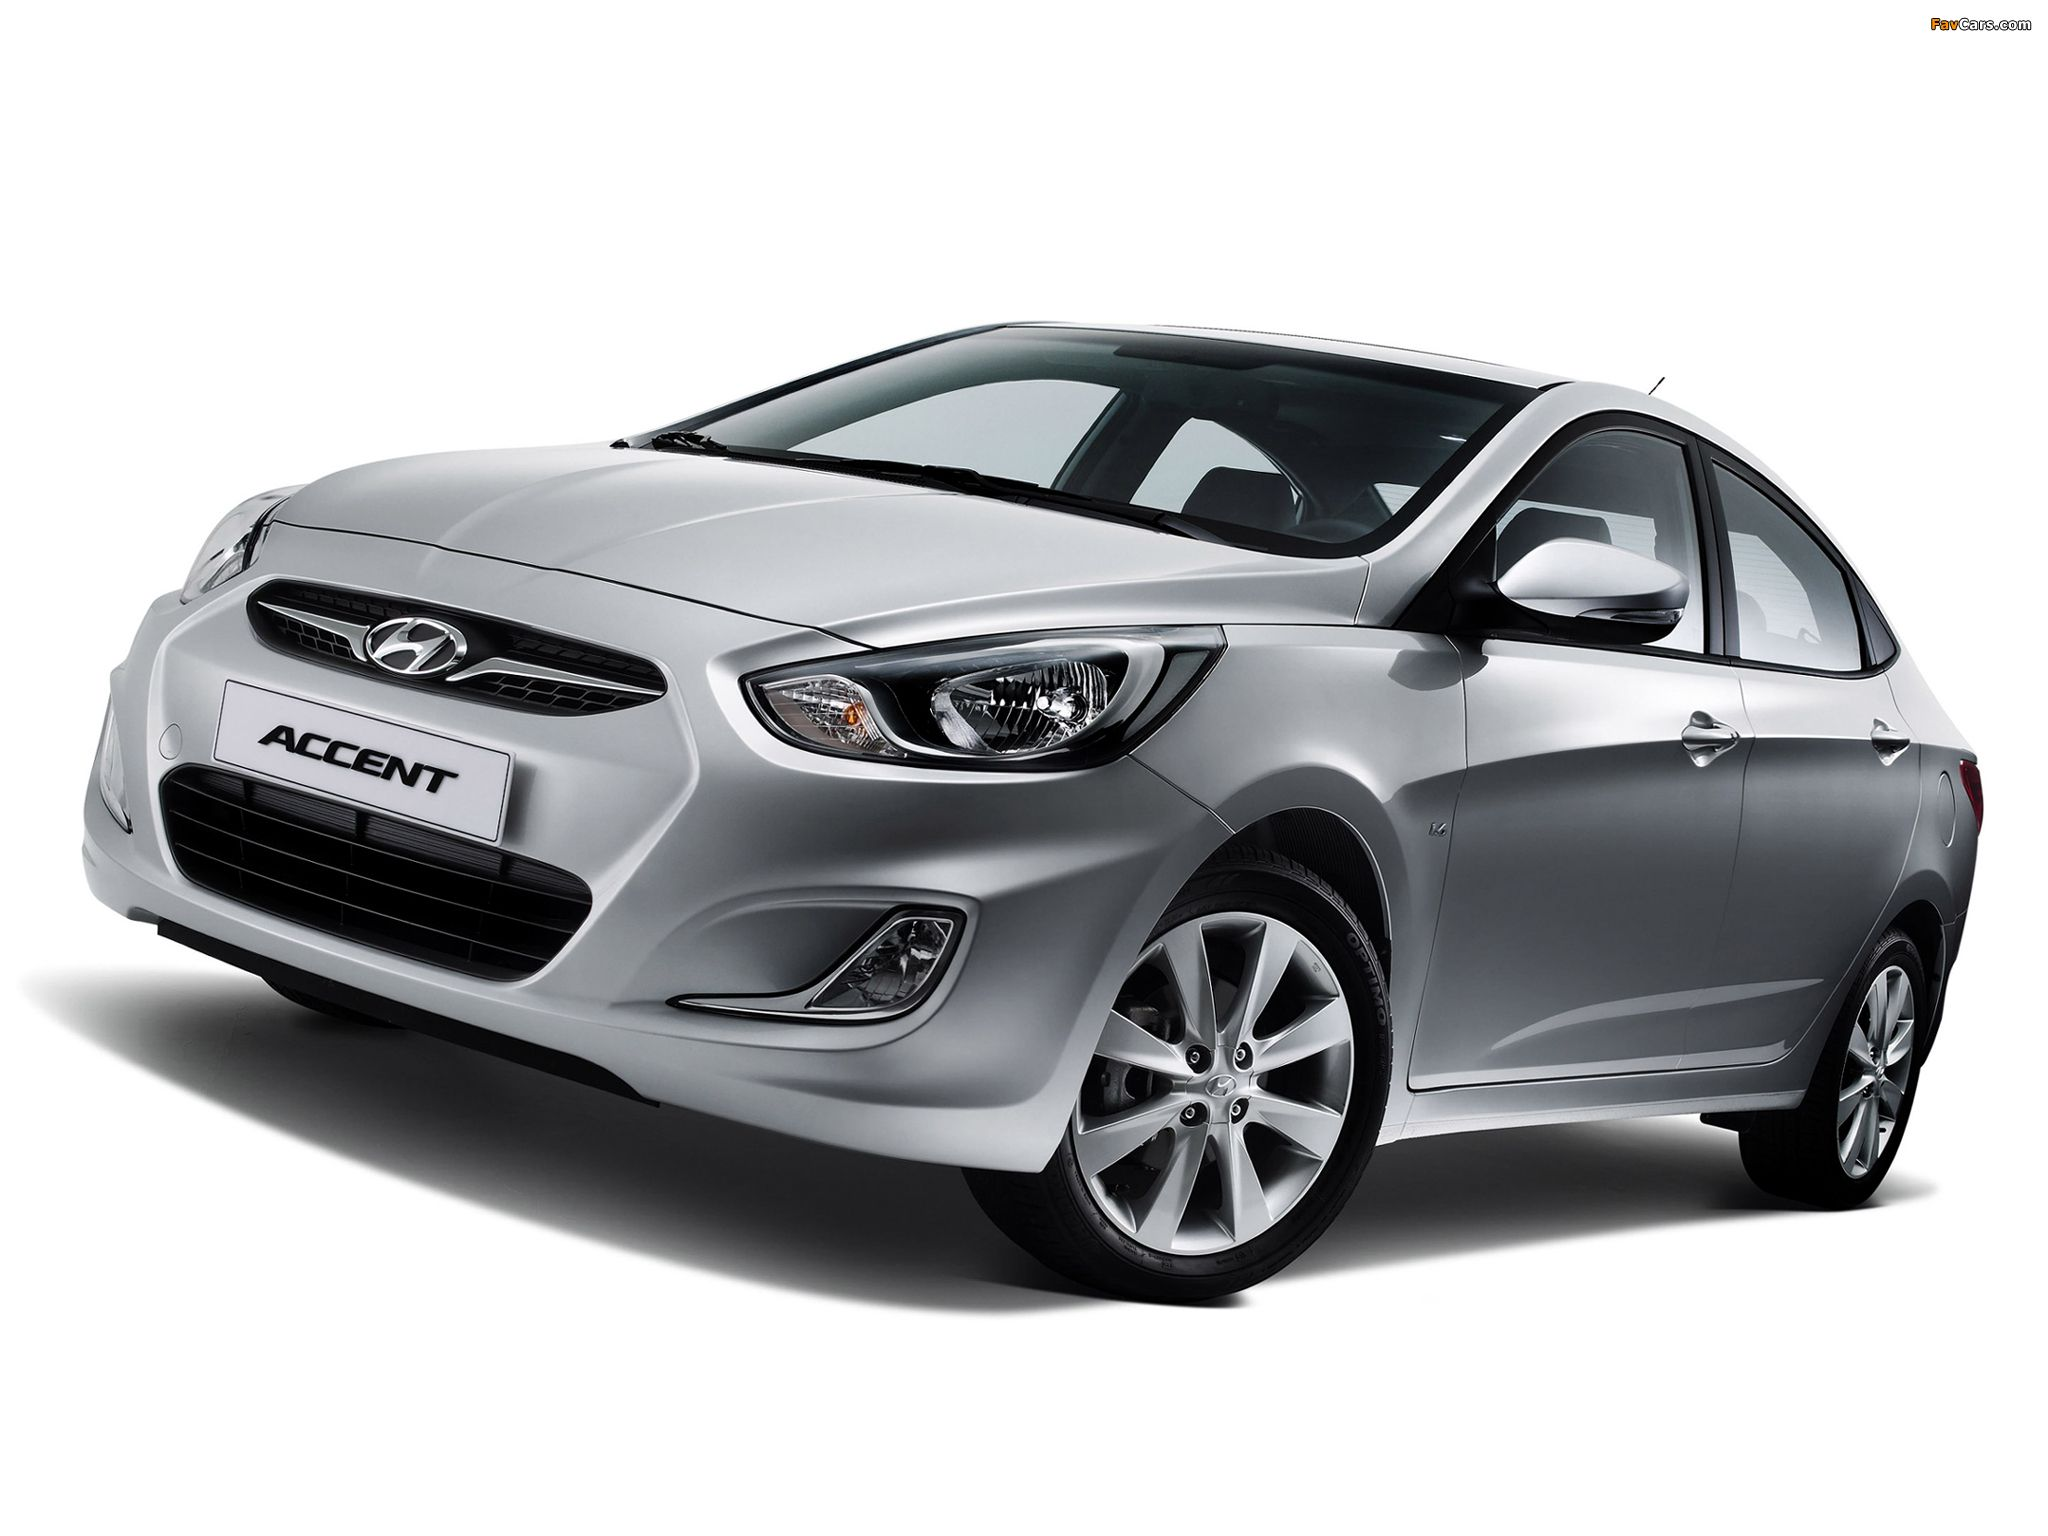 Hyundai Accent Wallpapers Wallpaper Hyundai accent Car 2048x1536